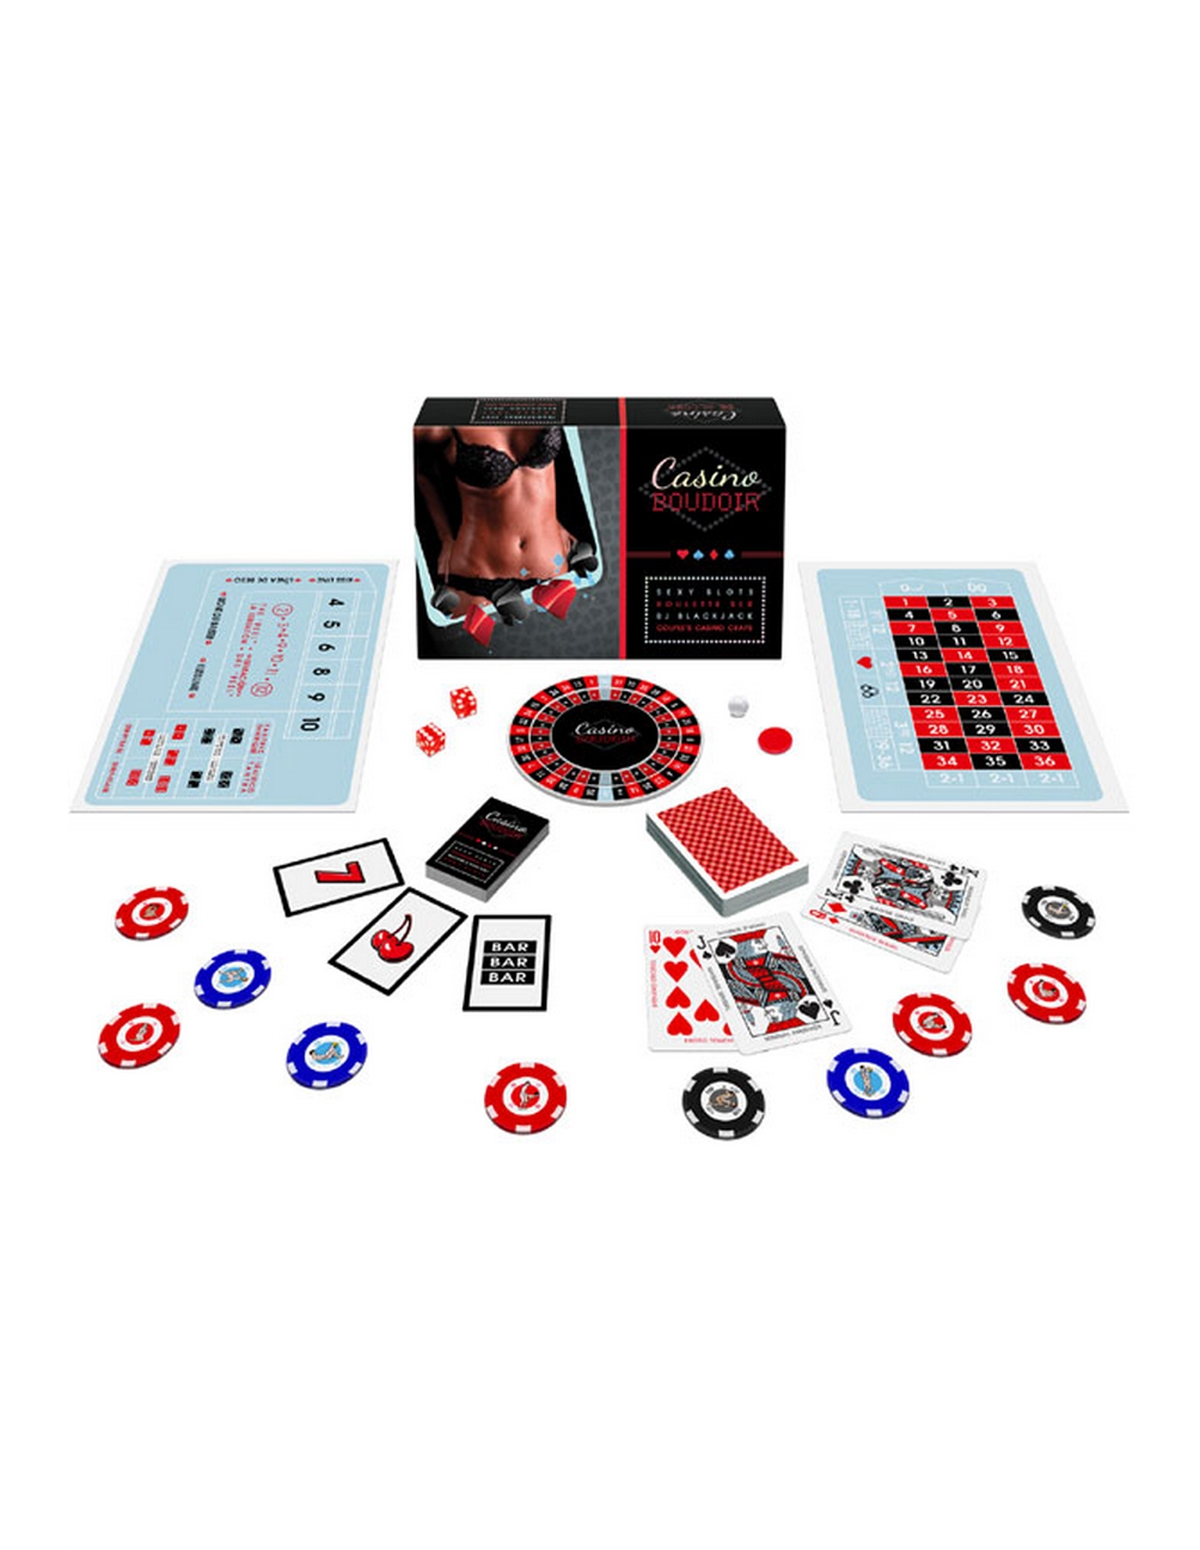 Casino Boudoir Game